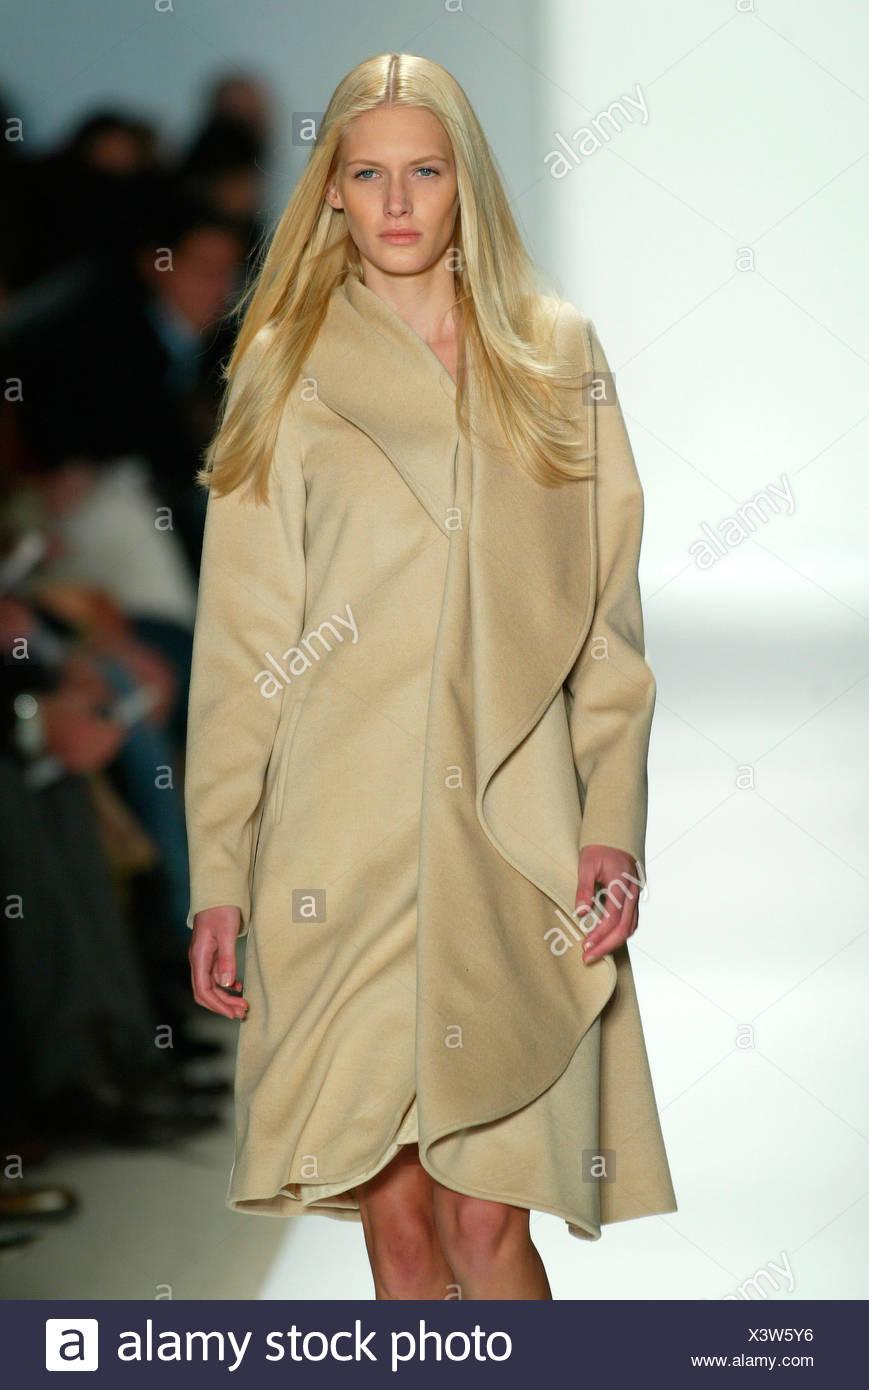 Luca Luca New York Ready to Wear Autumn Winter Blonde female model wearing a knee length camel drape coat - Stock Image